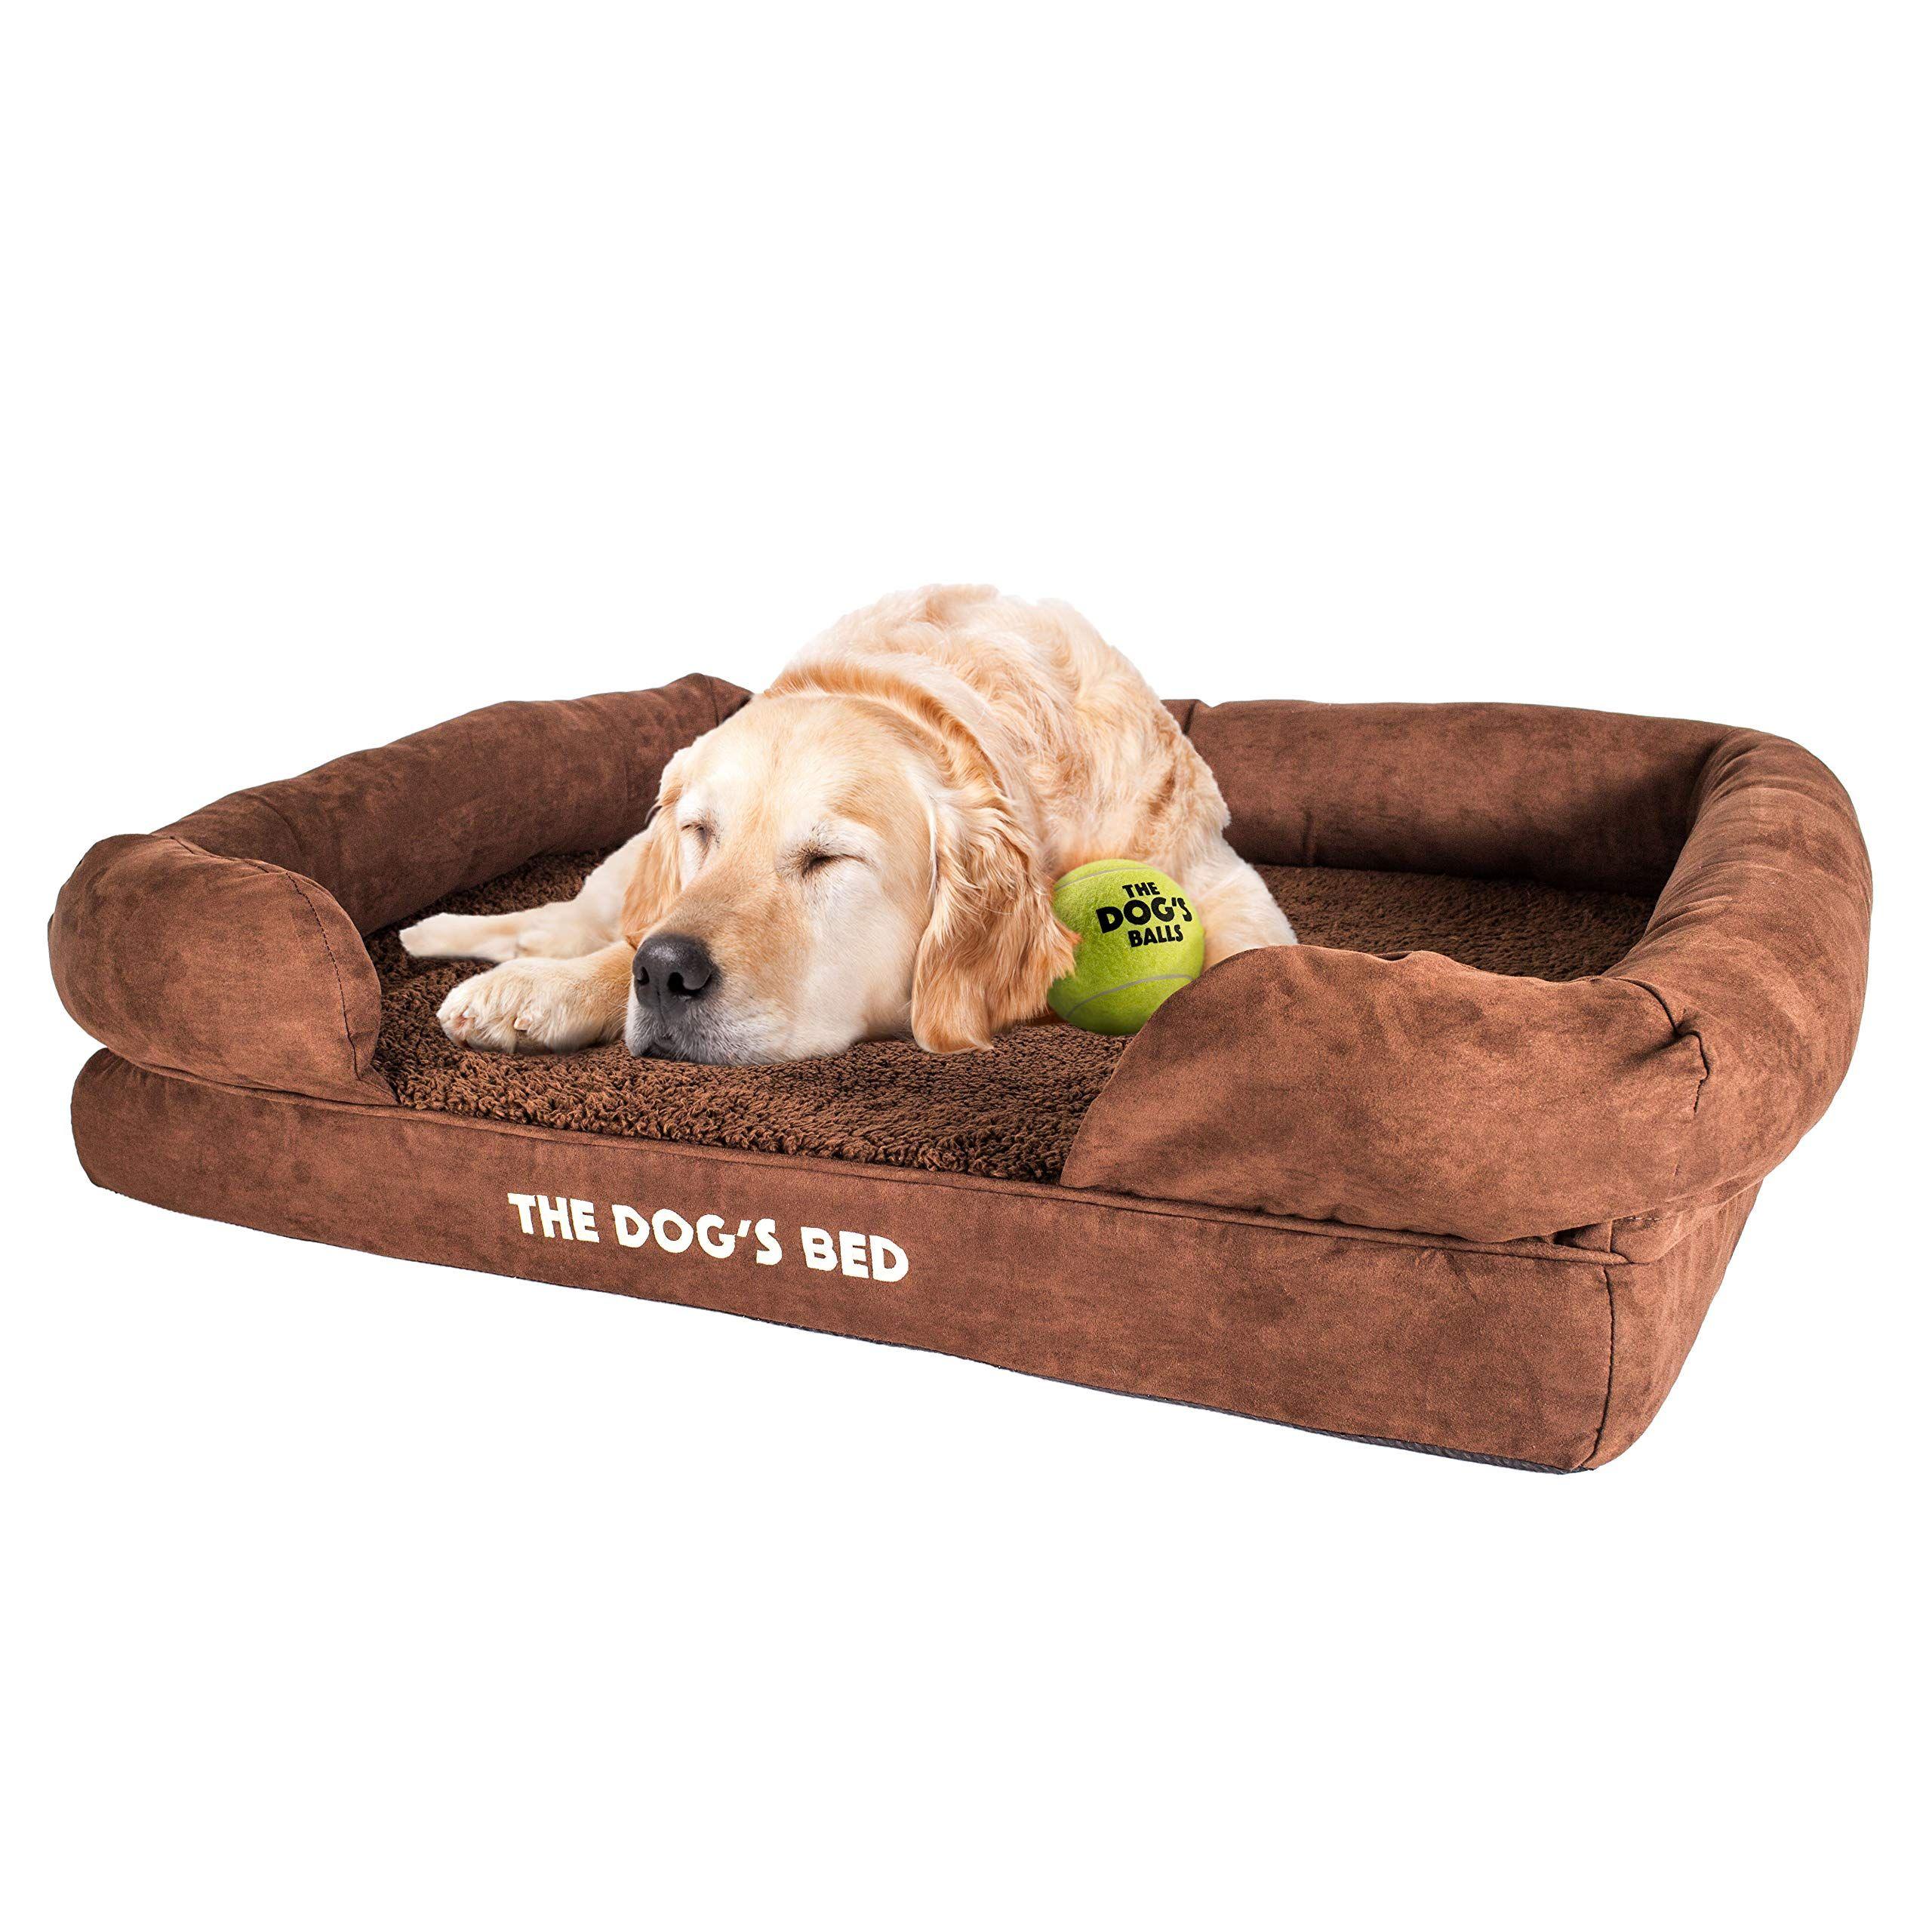 The Dogs Bed Orthopedic Premium Memory Foam Waterproof Dog